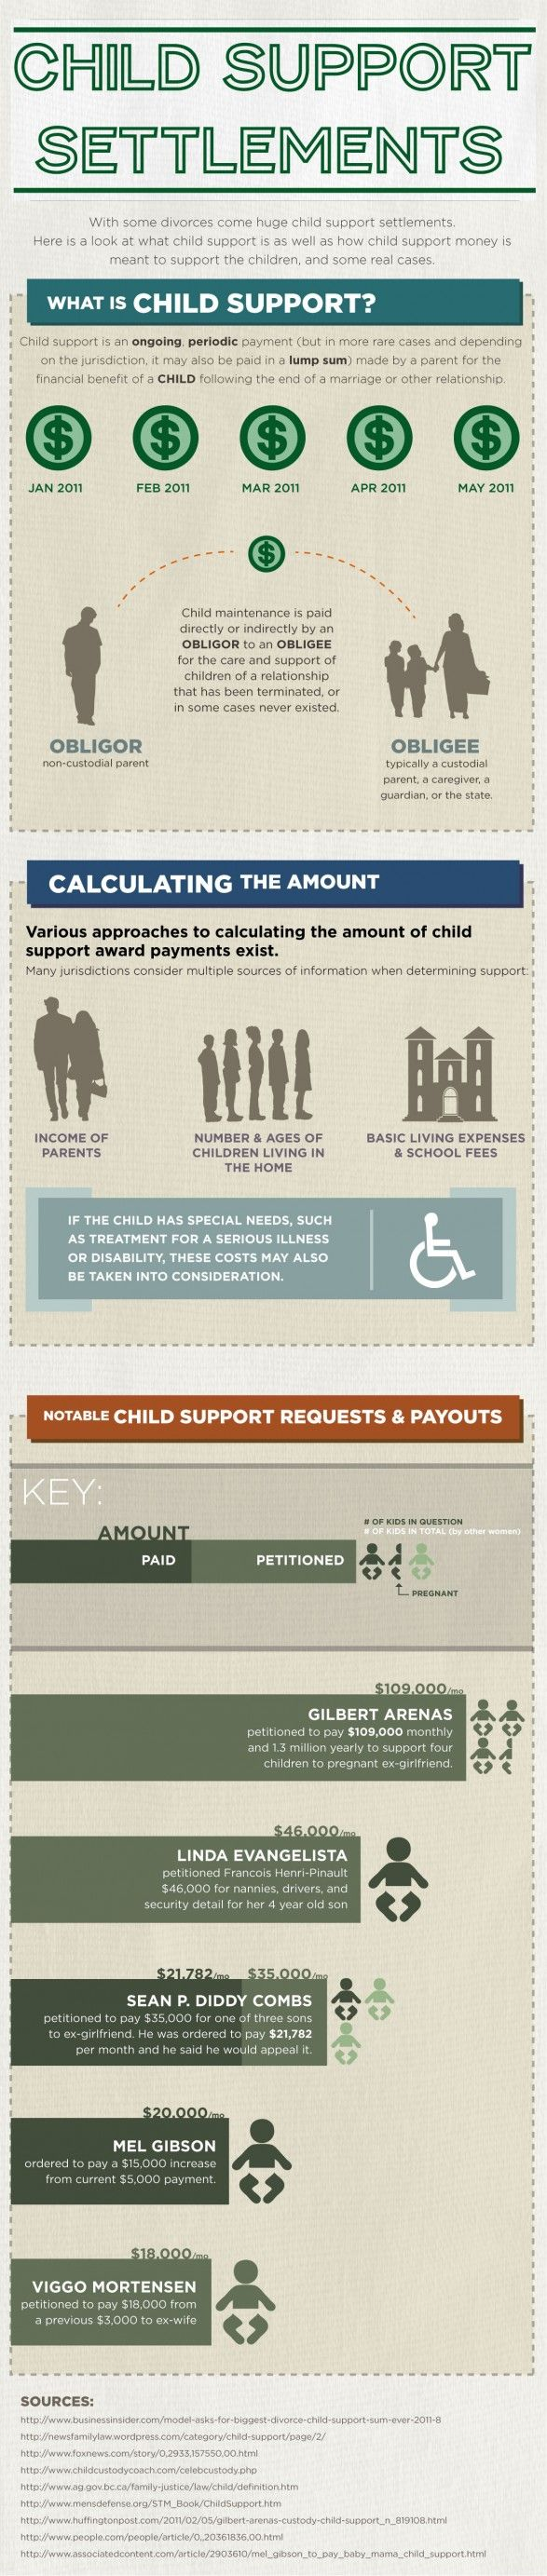 100 Child Support Worksheet Ga – Child Support Worksheet Ny